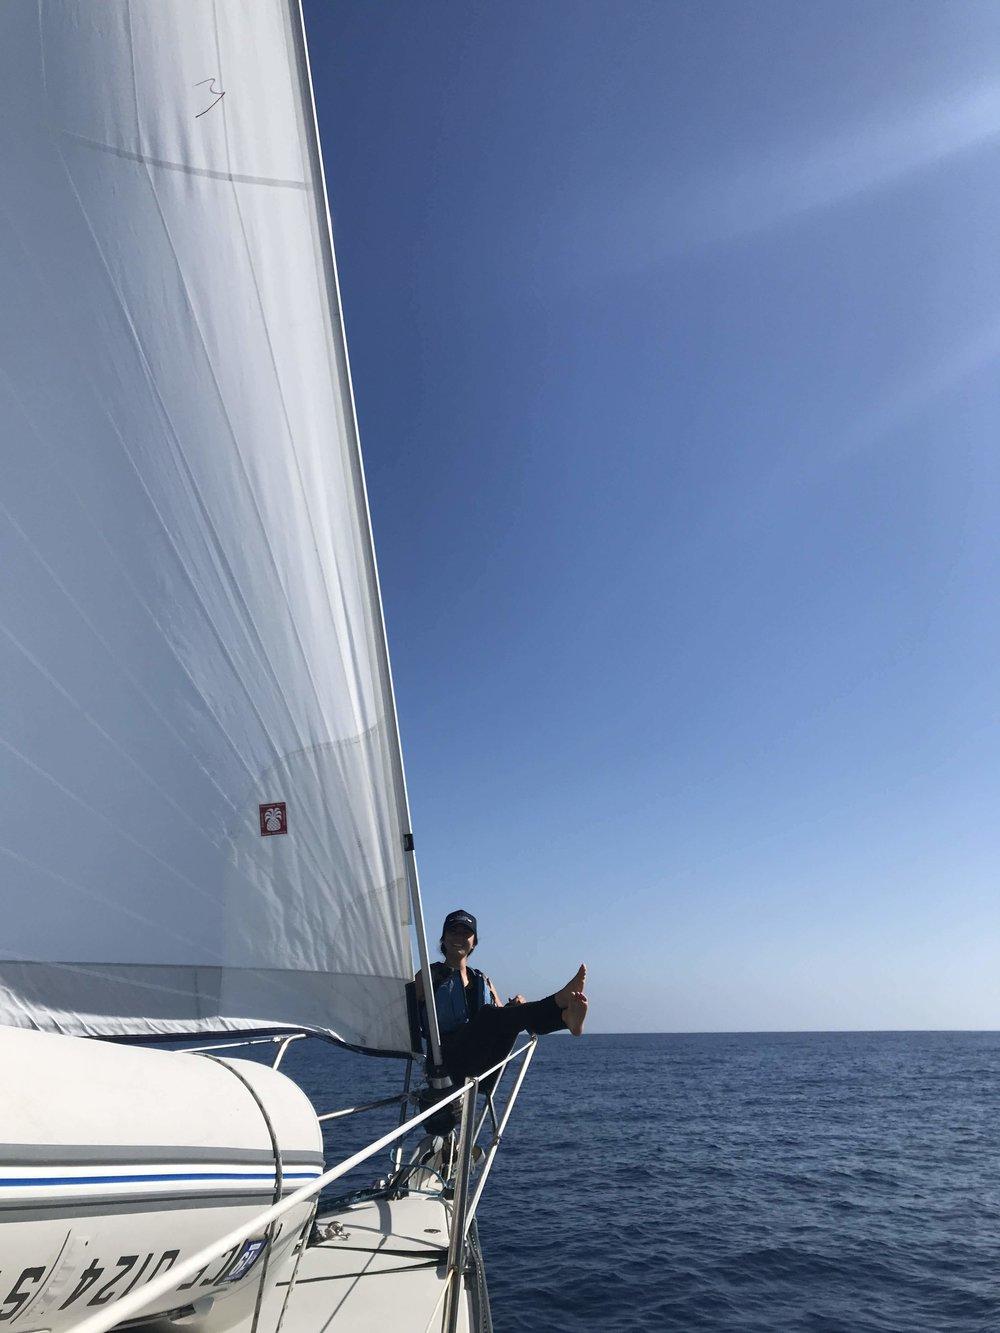 Dana has been sailing from San Francisco to Baja California